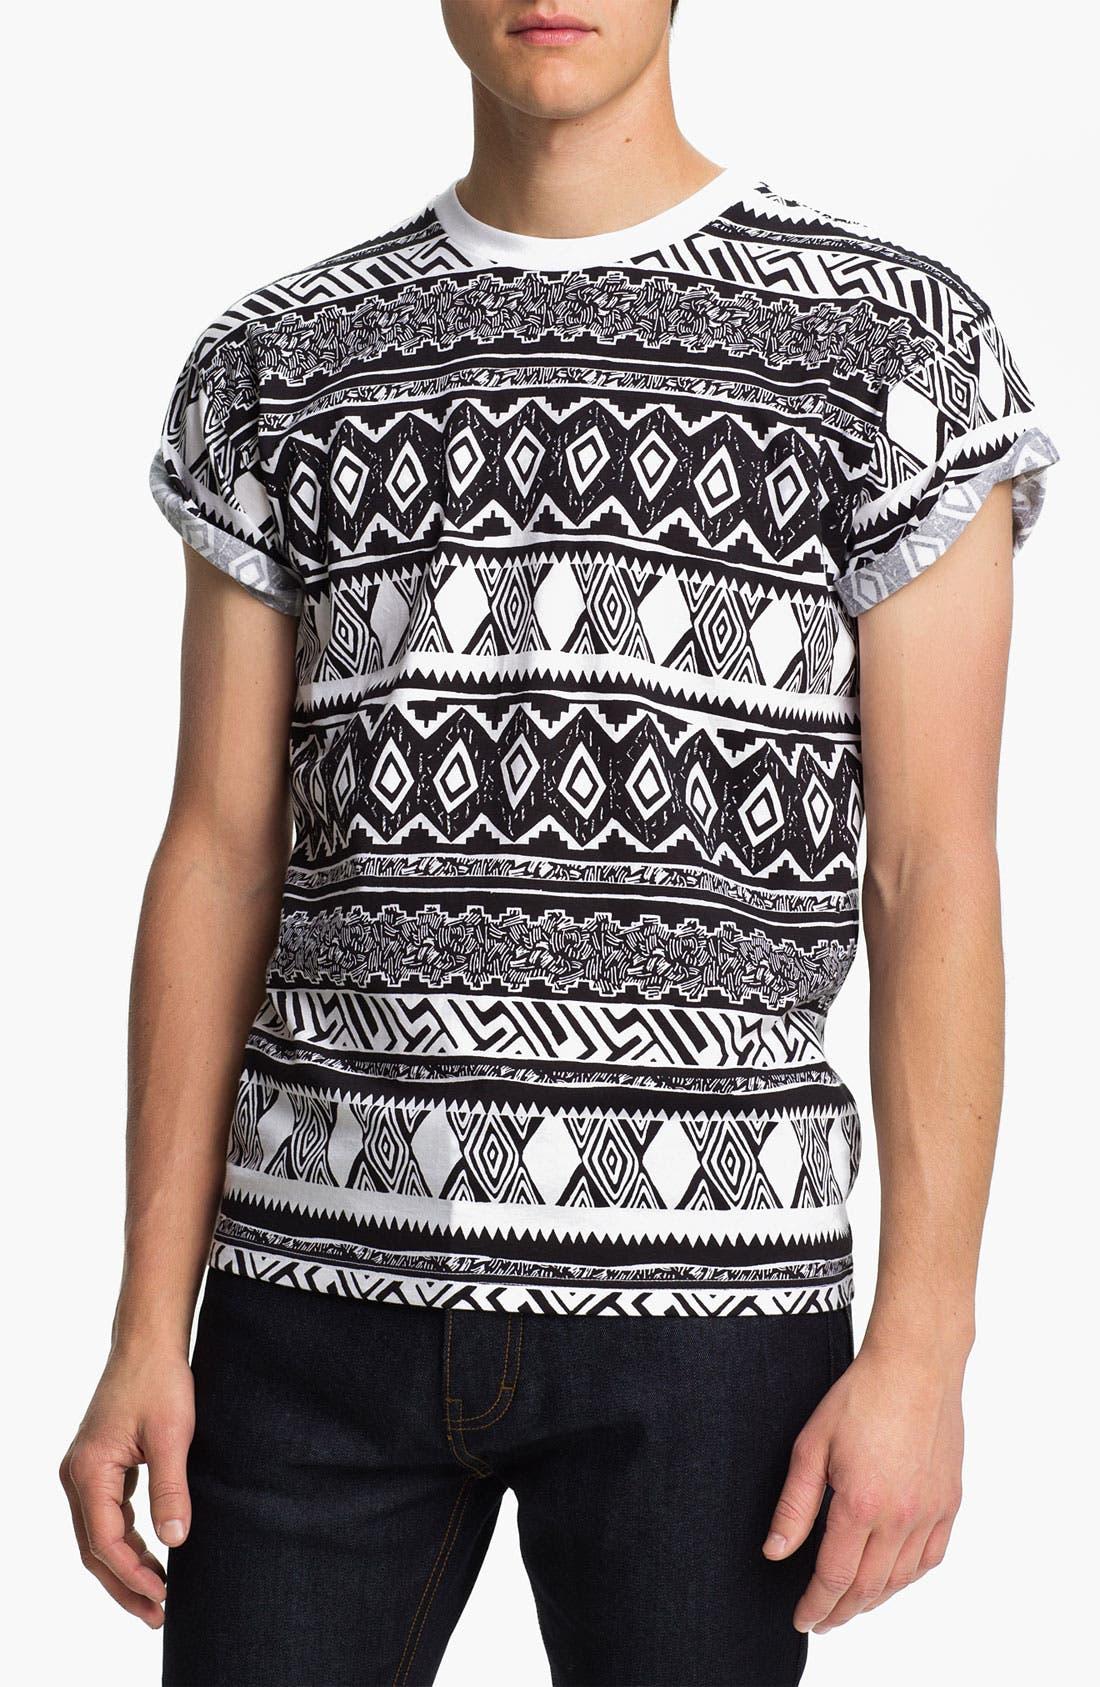 Alternate Image 1 Selected - Topman 'High Roller' All Over Pattern Print T-Shirt